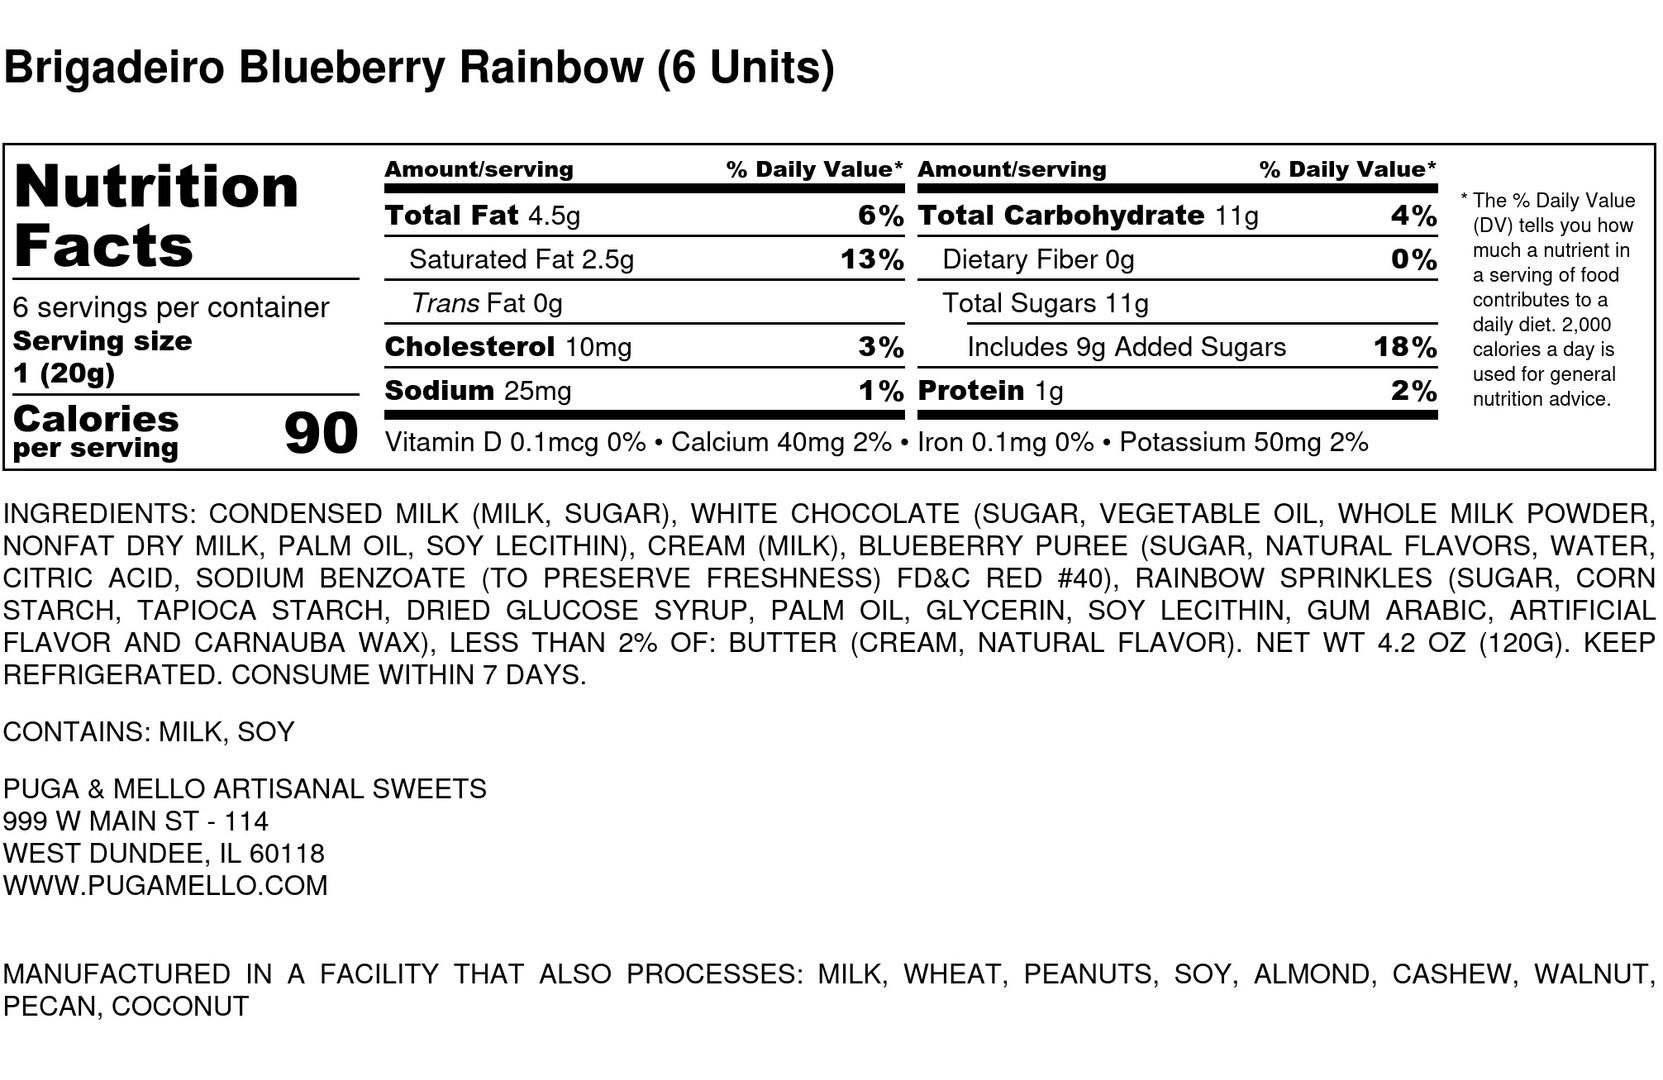 Brigadeiro Blueberry Rainbow (6 Units) -